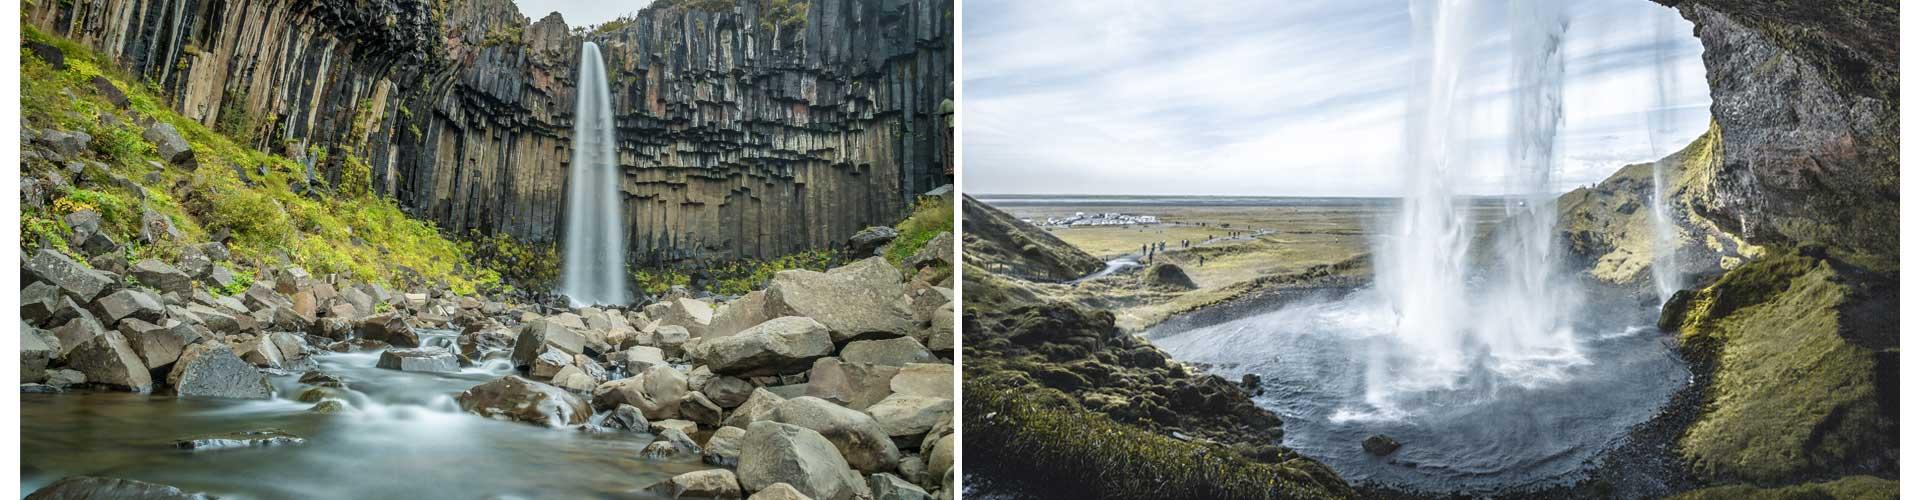 Island Reisetagebuch wasserfall natur